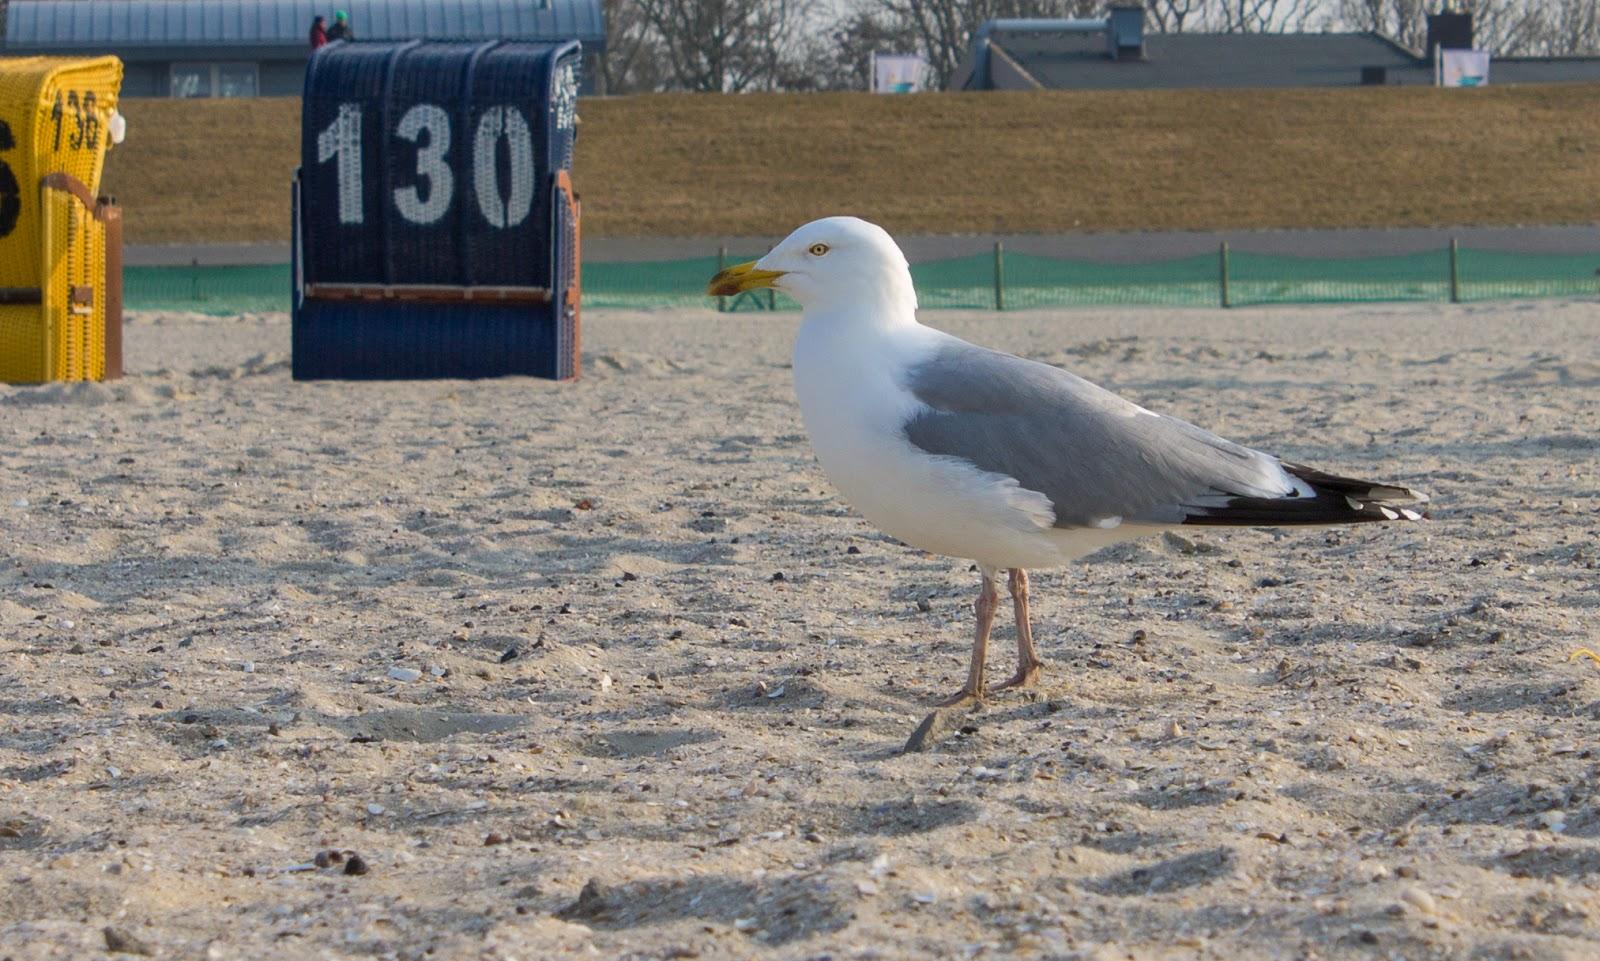 Fotografien und Schnappschüsse: Nordseevögel